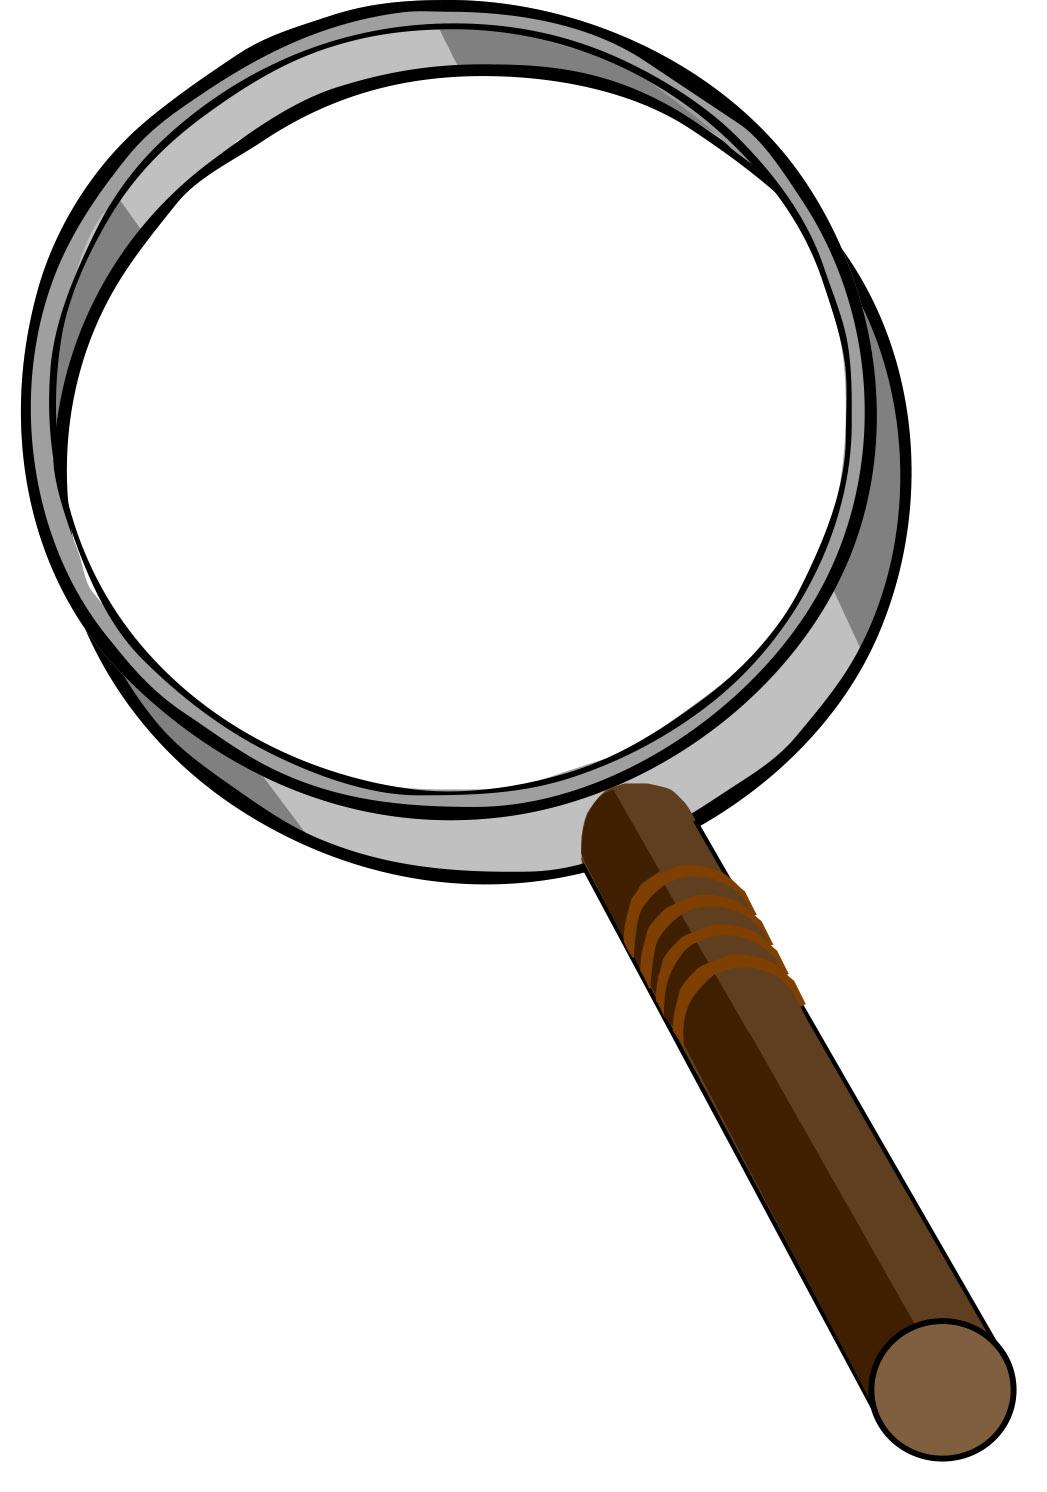 1047x1492 Magnifying Glass Magnifier Glass Clip Art